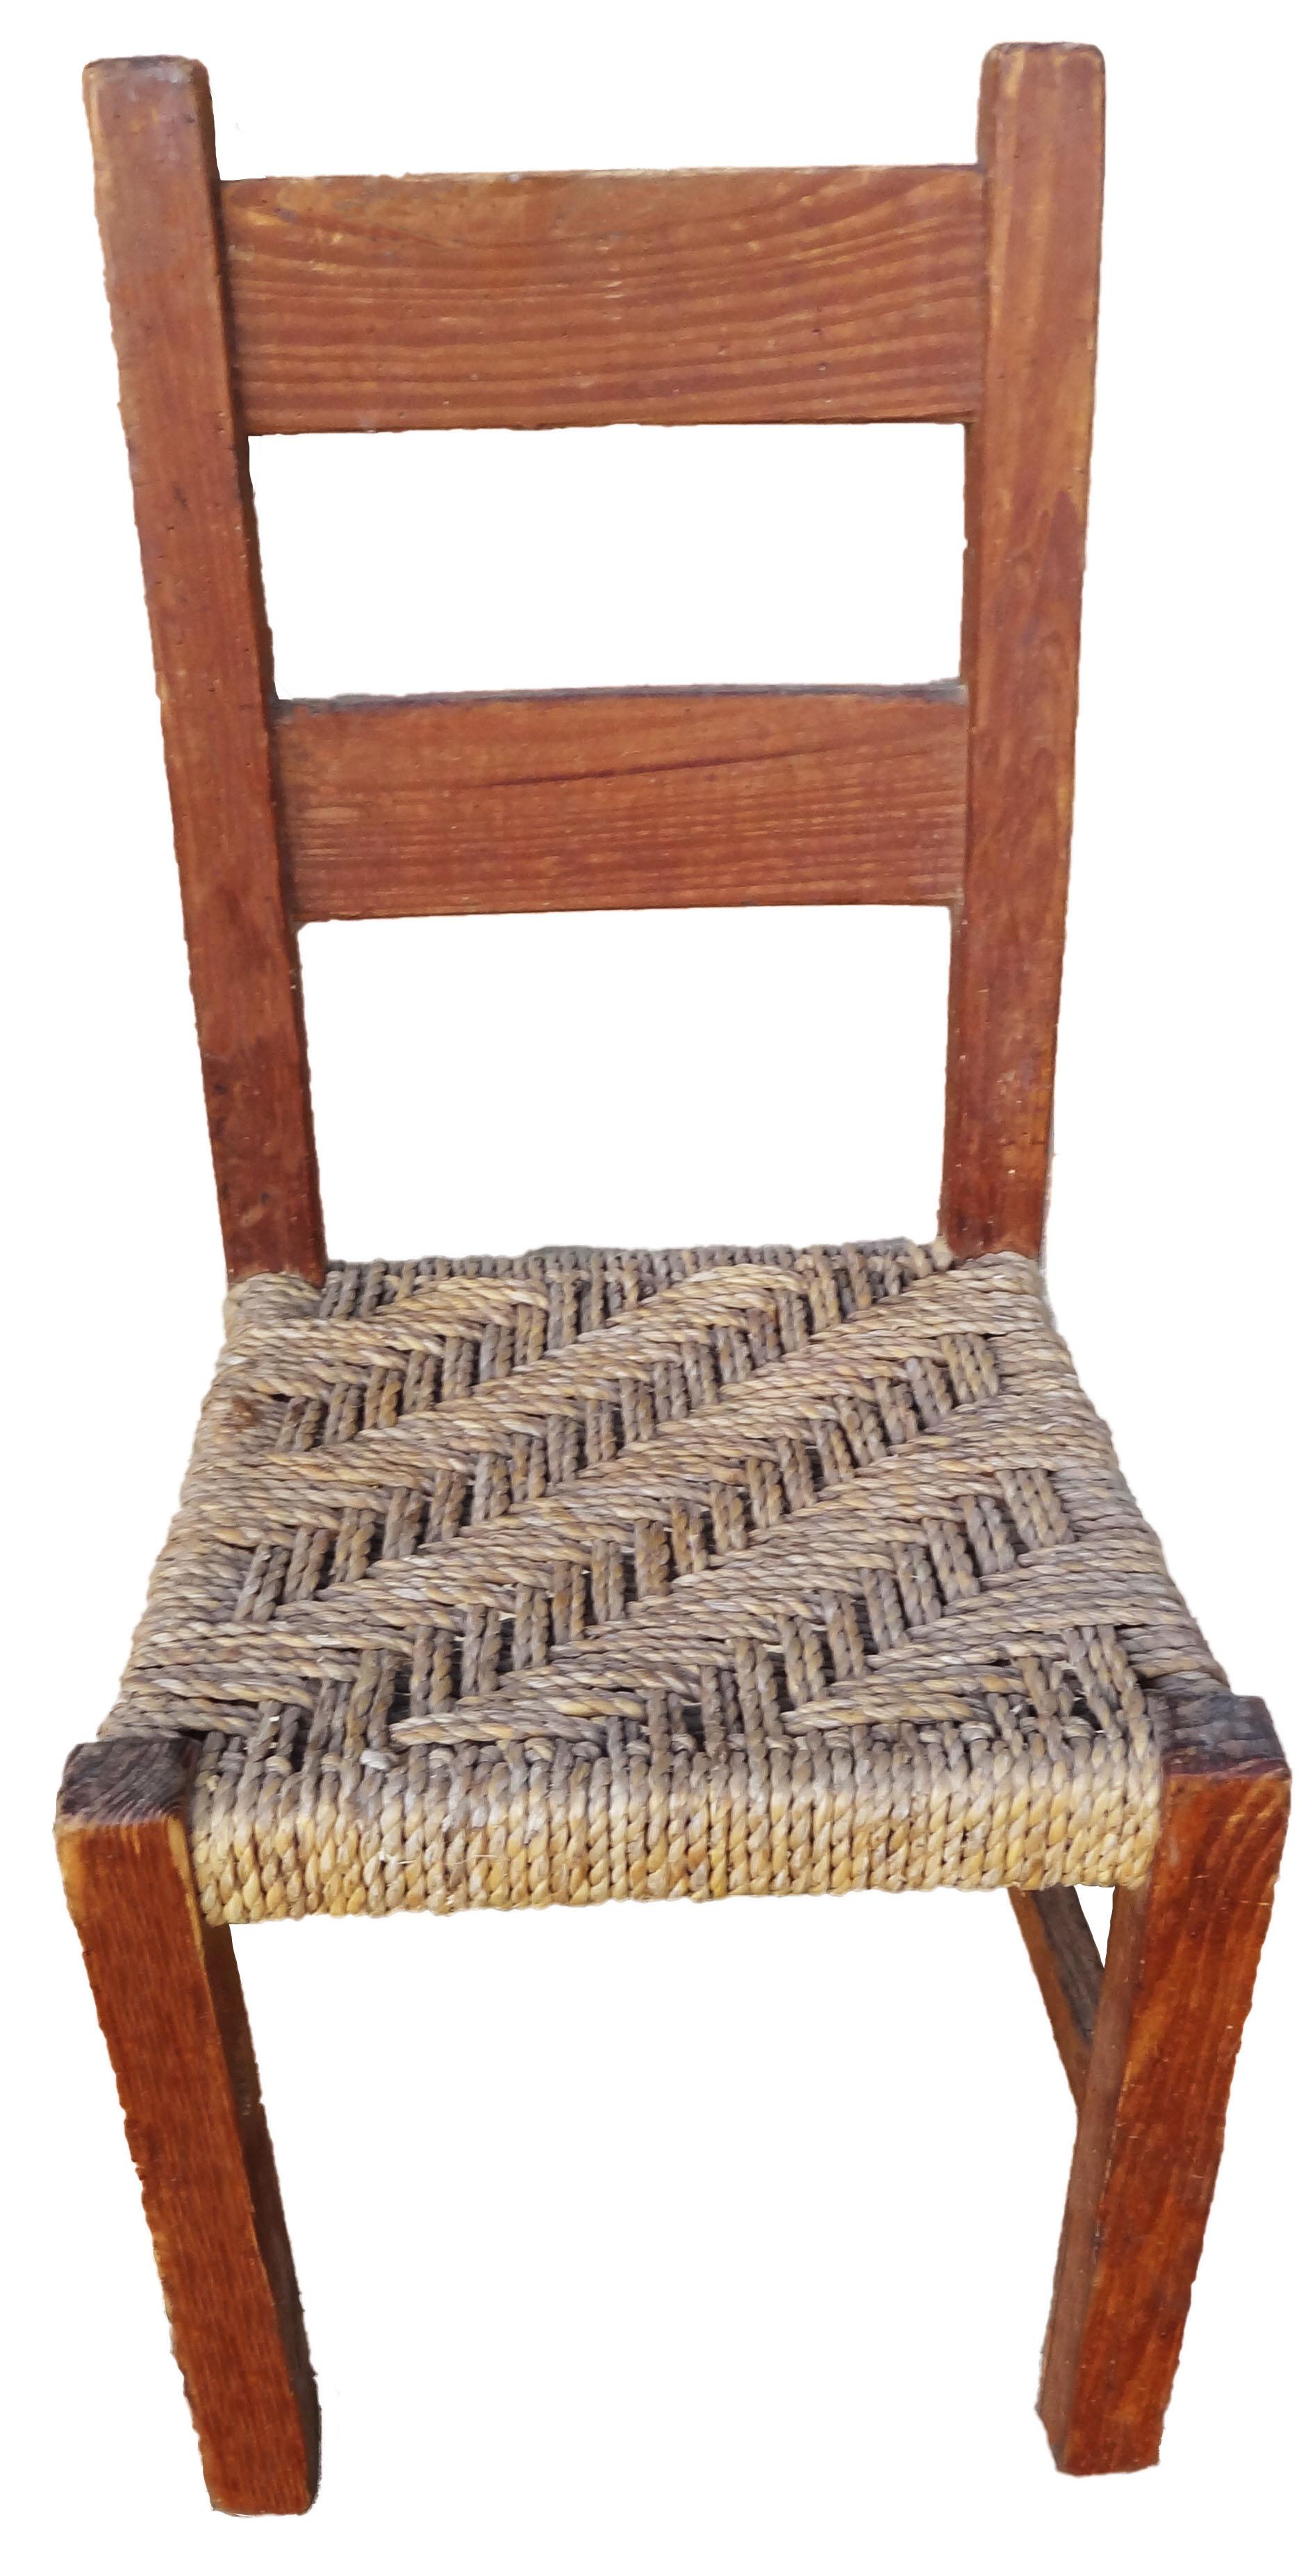 Sillas antiguas y modernas inicio for Sillas antiguas tapizadas modernas